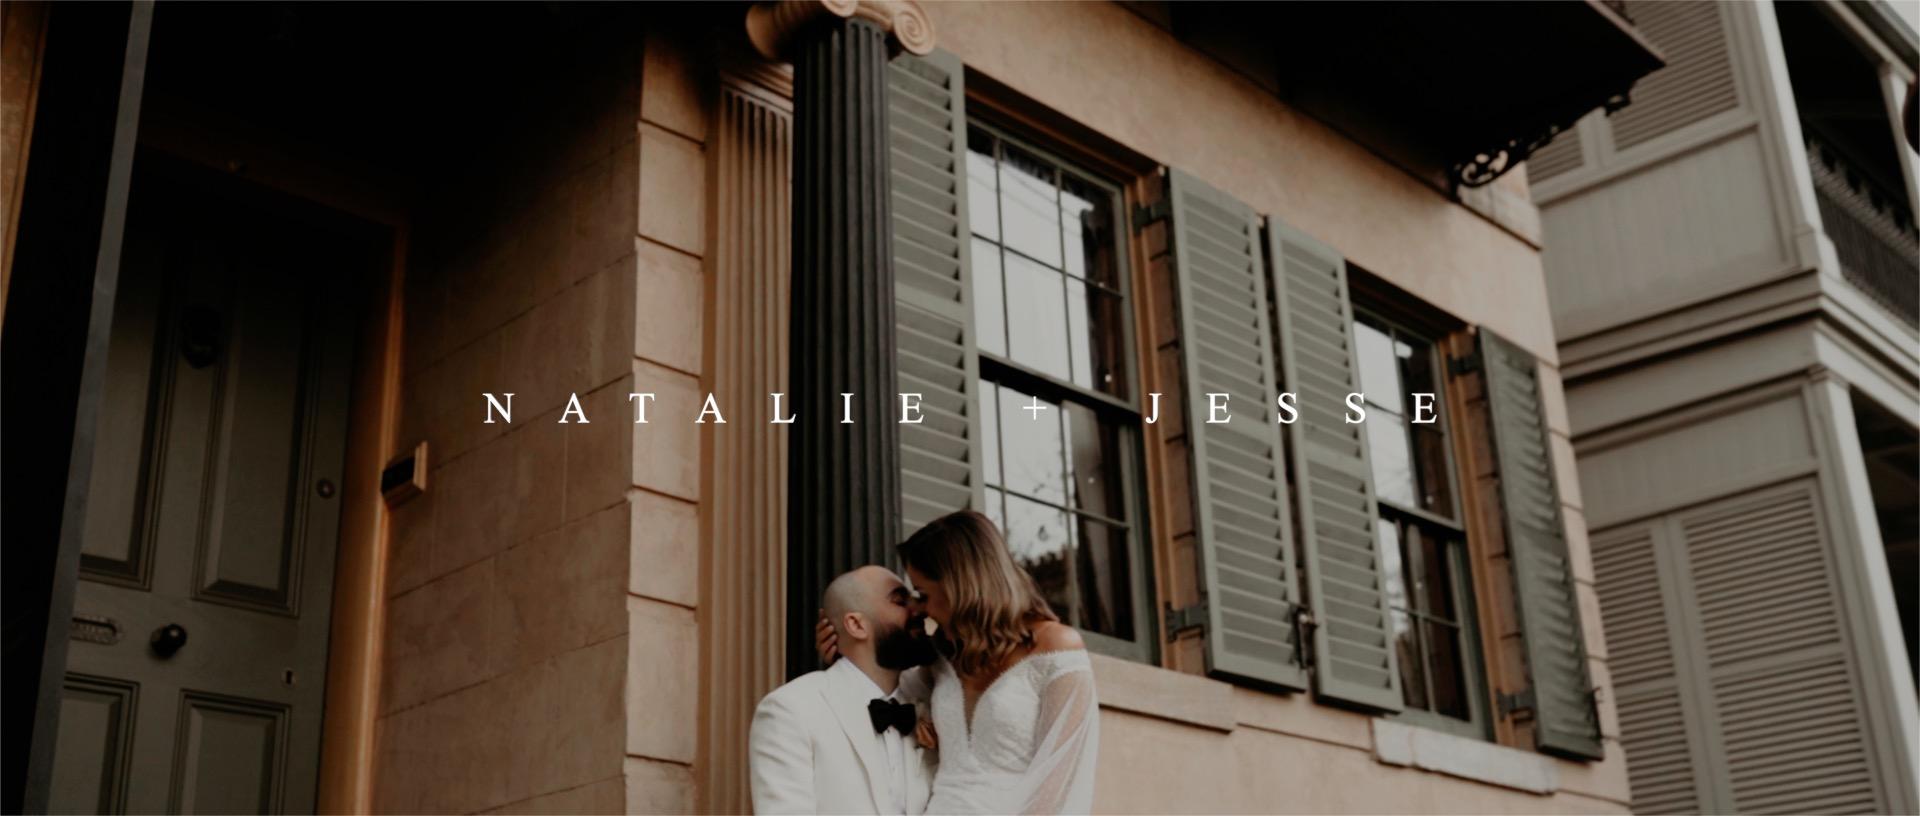 Natalie + Jesse | Sydney, Australia | none